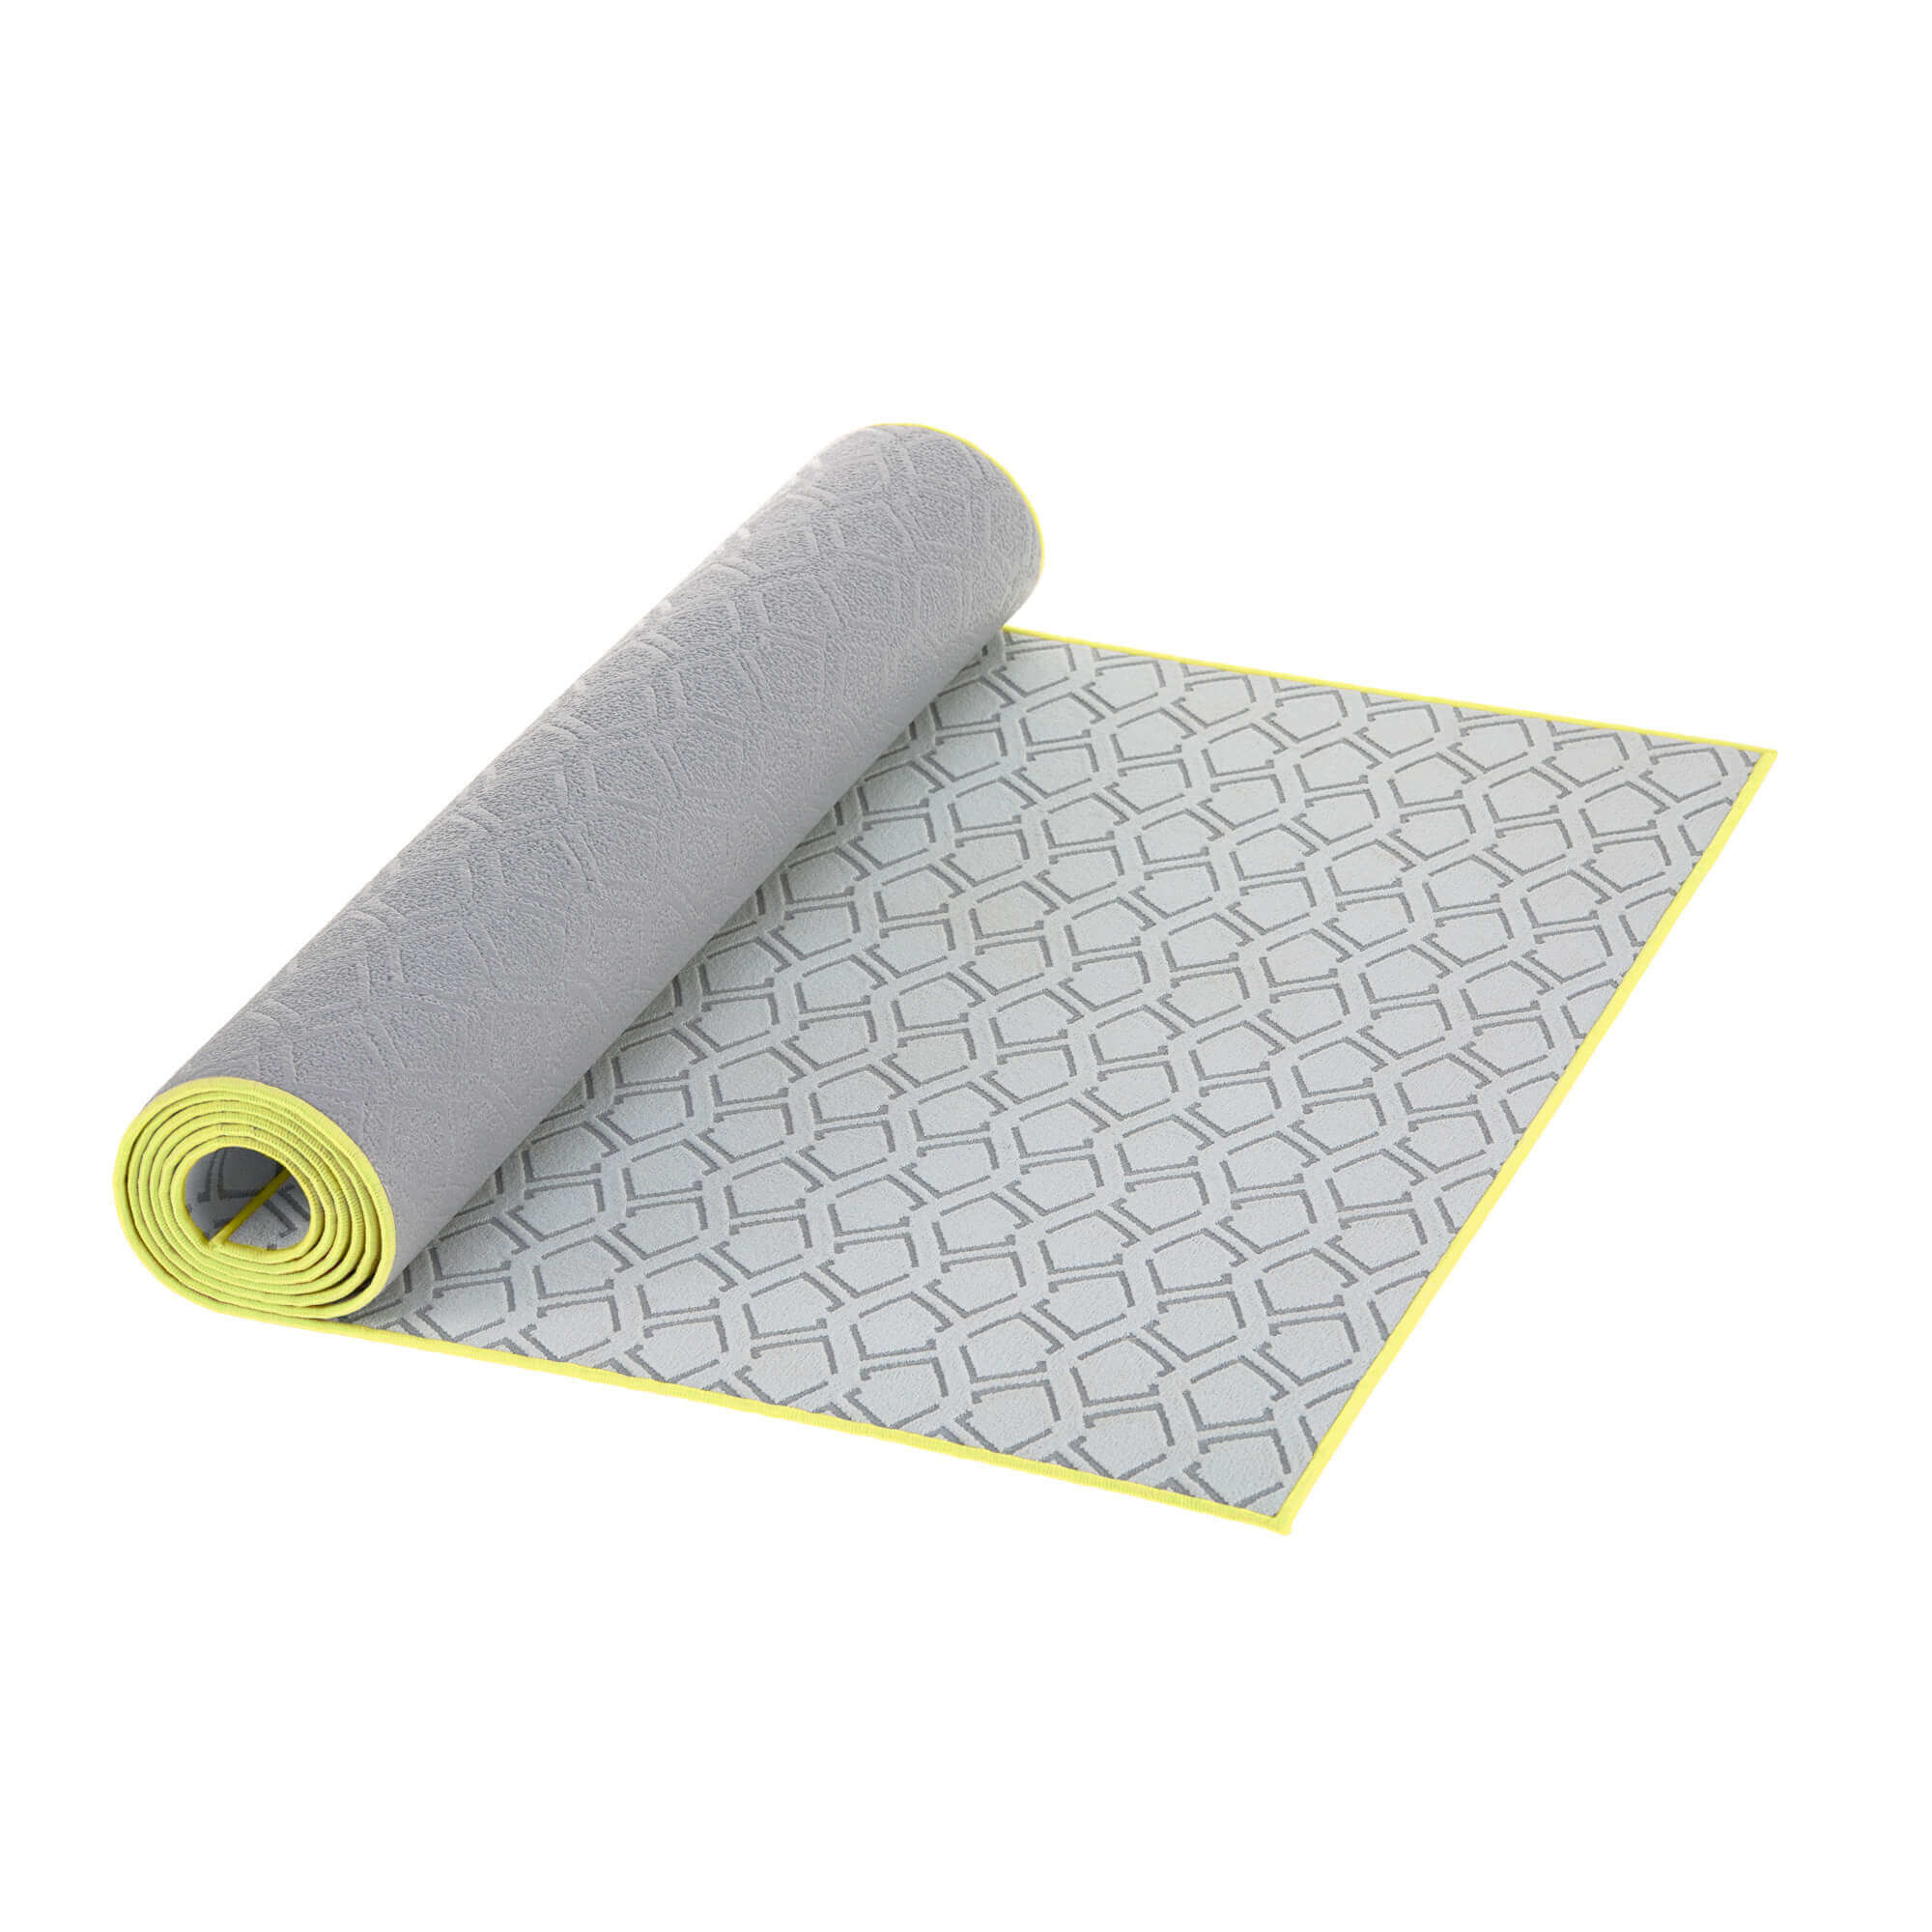 Lässig Lässig Yogamat grey 2e Kansje